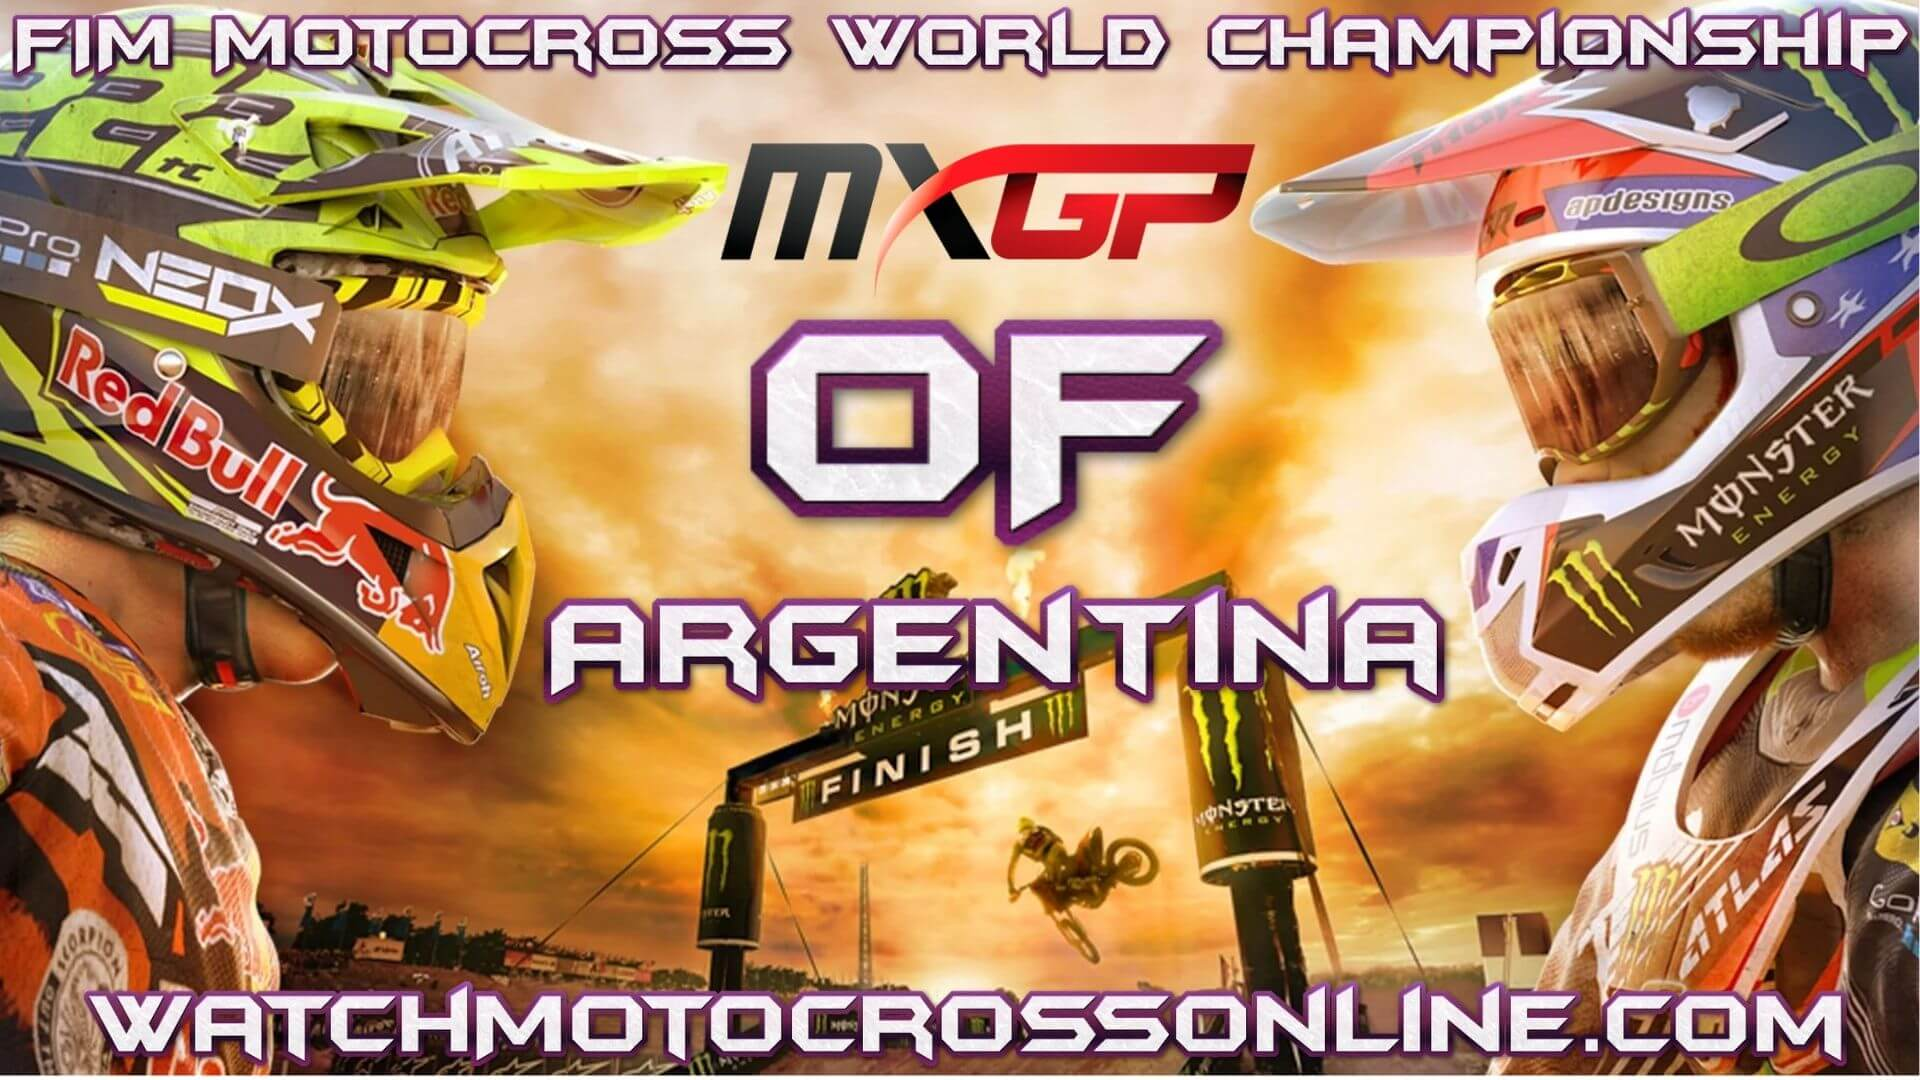 MXGP of Argentina Live Stream 2020